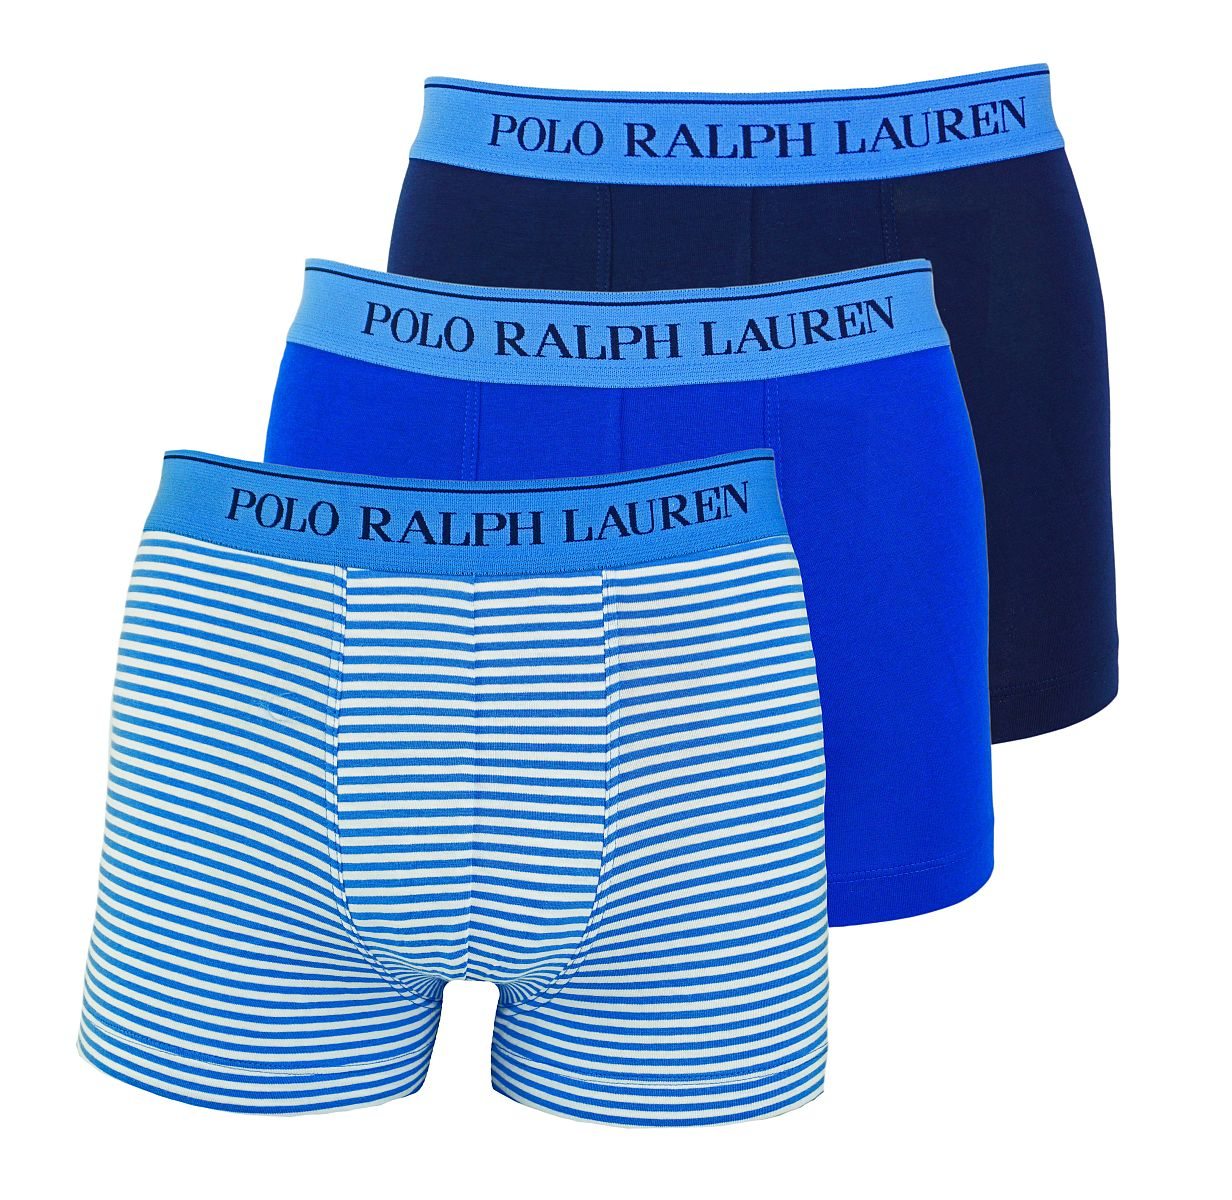 Ralph Lauren 3er Pack Boxershorts Trunks Spring1UDW NAVY/BLUE STRIPE/SAPPHIRE W18-US1